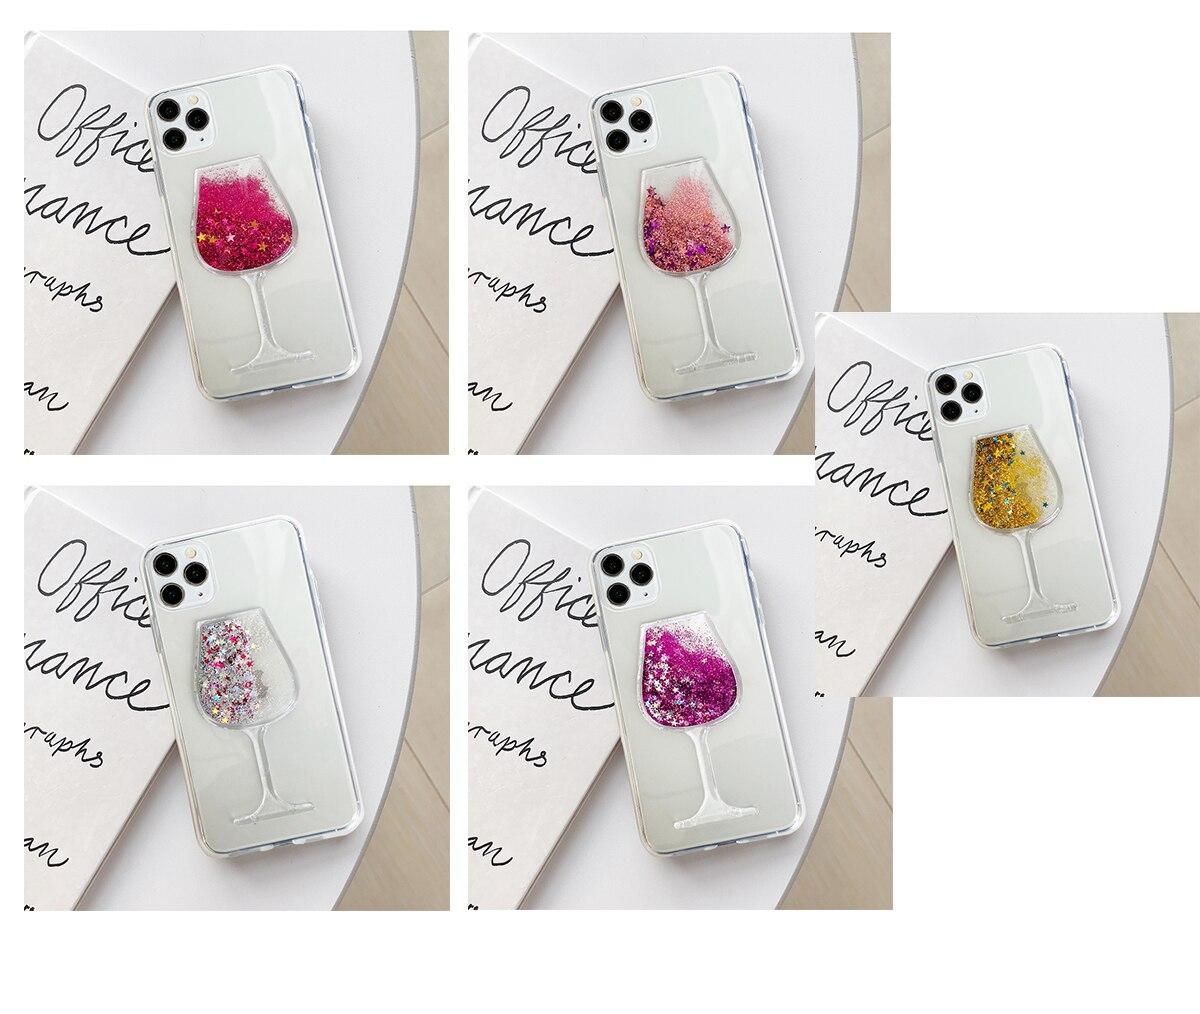 Wine Glass Glitter Star Water Liquid Phone Case for Samsung GALAXY A01 A10 A10S A11 A20 A30 A20E A10E M10S M20S Soft TPU Cover